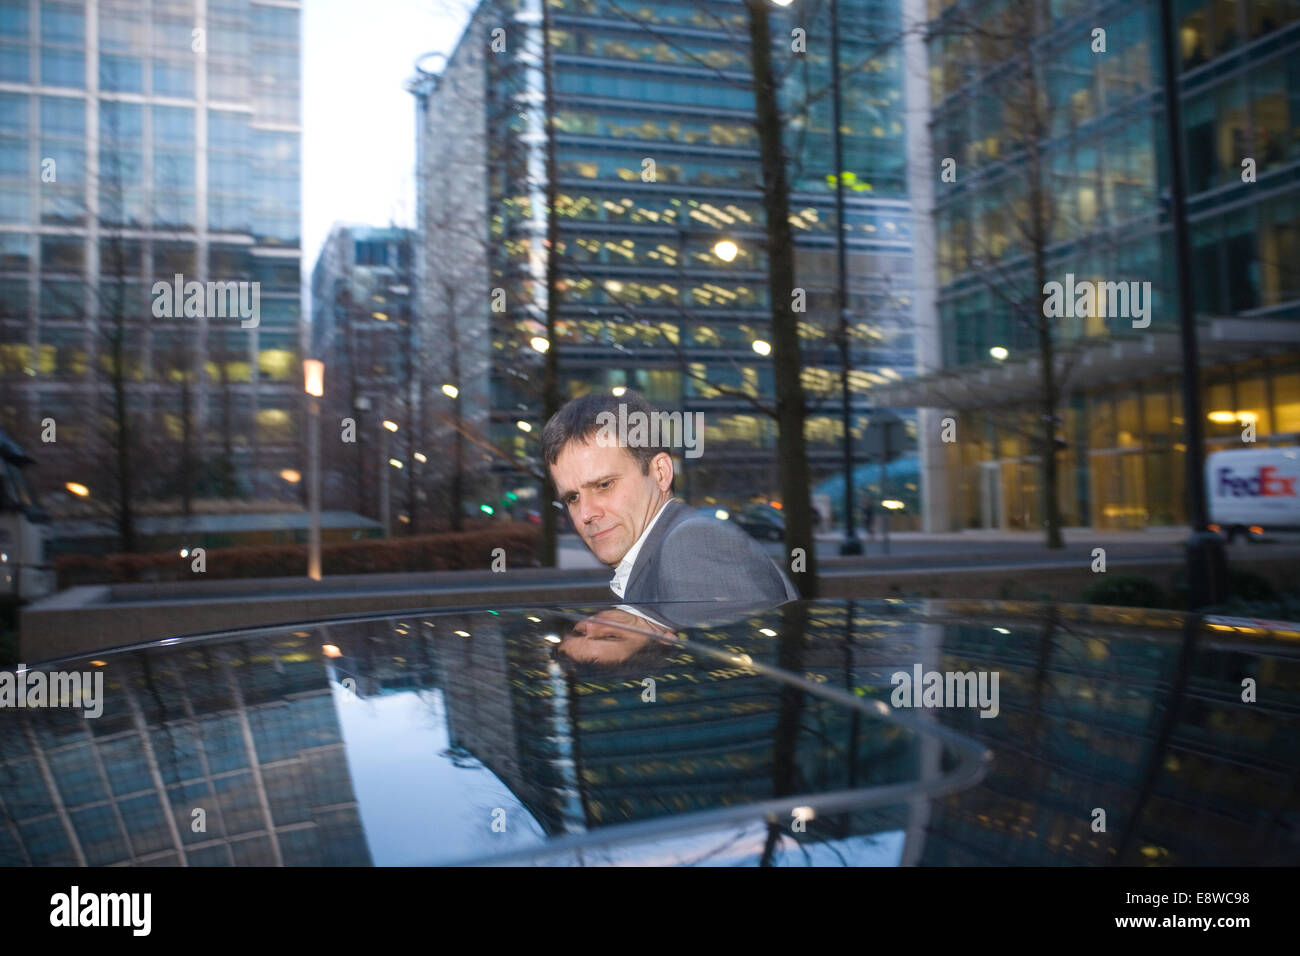 FILE PIX: London, UK. 15th Jan, 2009. Helge Lund resigns, Canary Wharf, London, UK This morning Statoil President Stock Photo